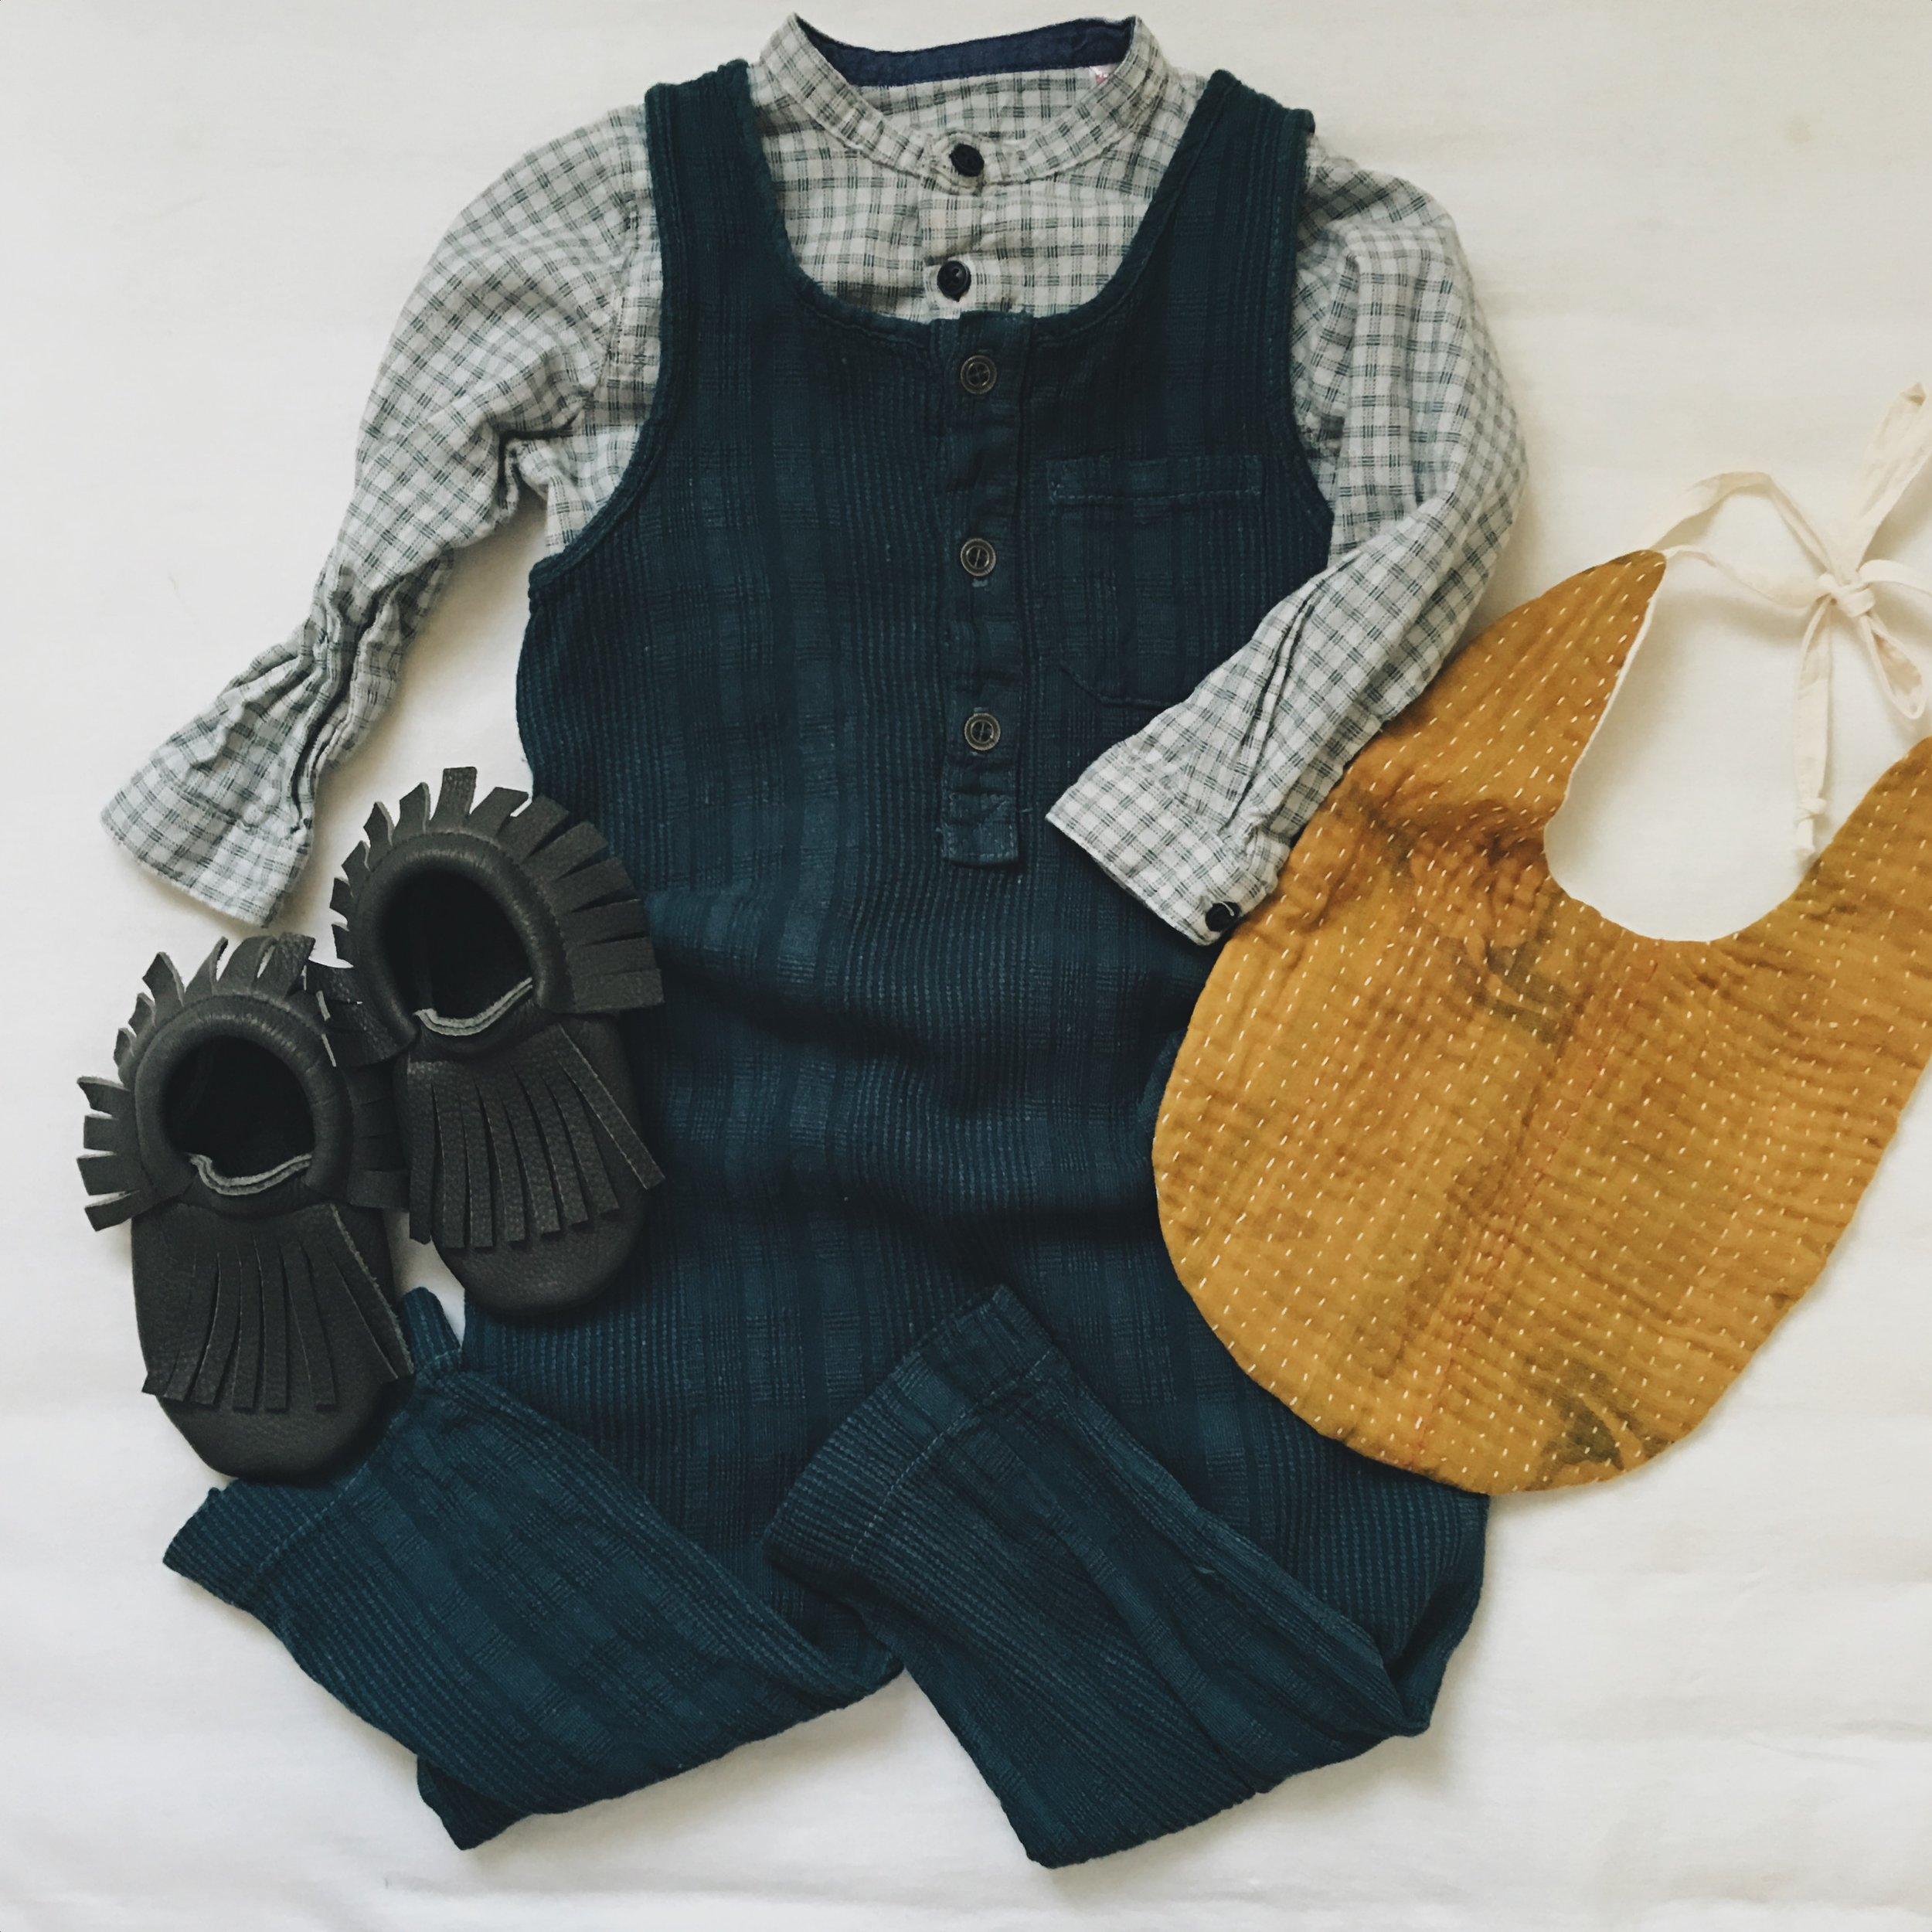 Romper -  Nico Nico Clothing  c/o  Murray & Finn  ; Plaid Shirt -  Zara  ; Bib -  Wild Winnie  ;  Raven Moccasins  c/o  Little Pine Outfitters